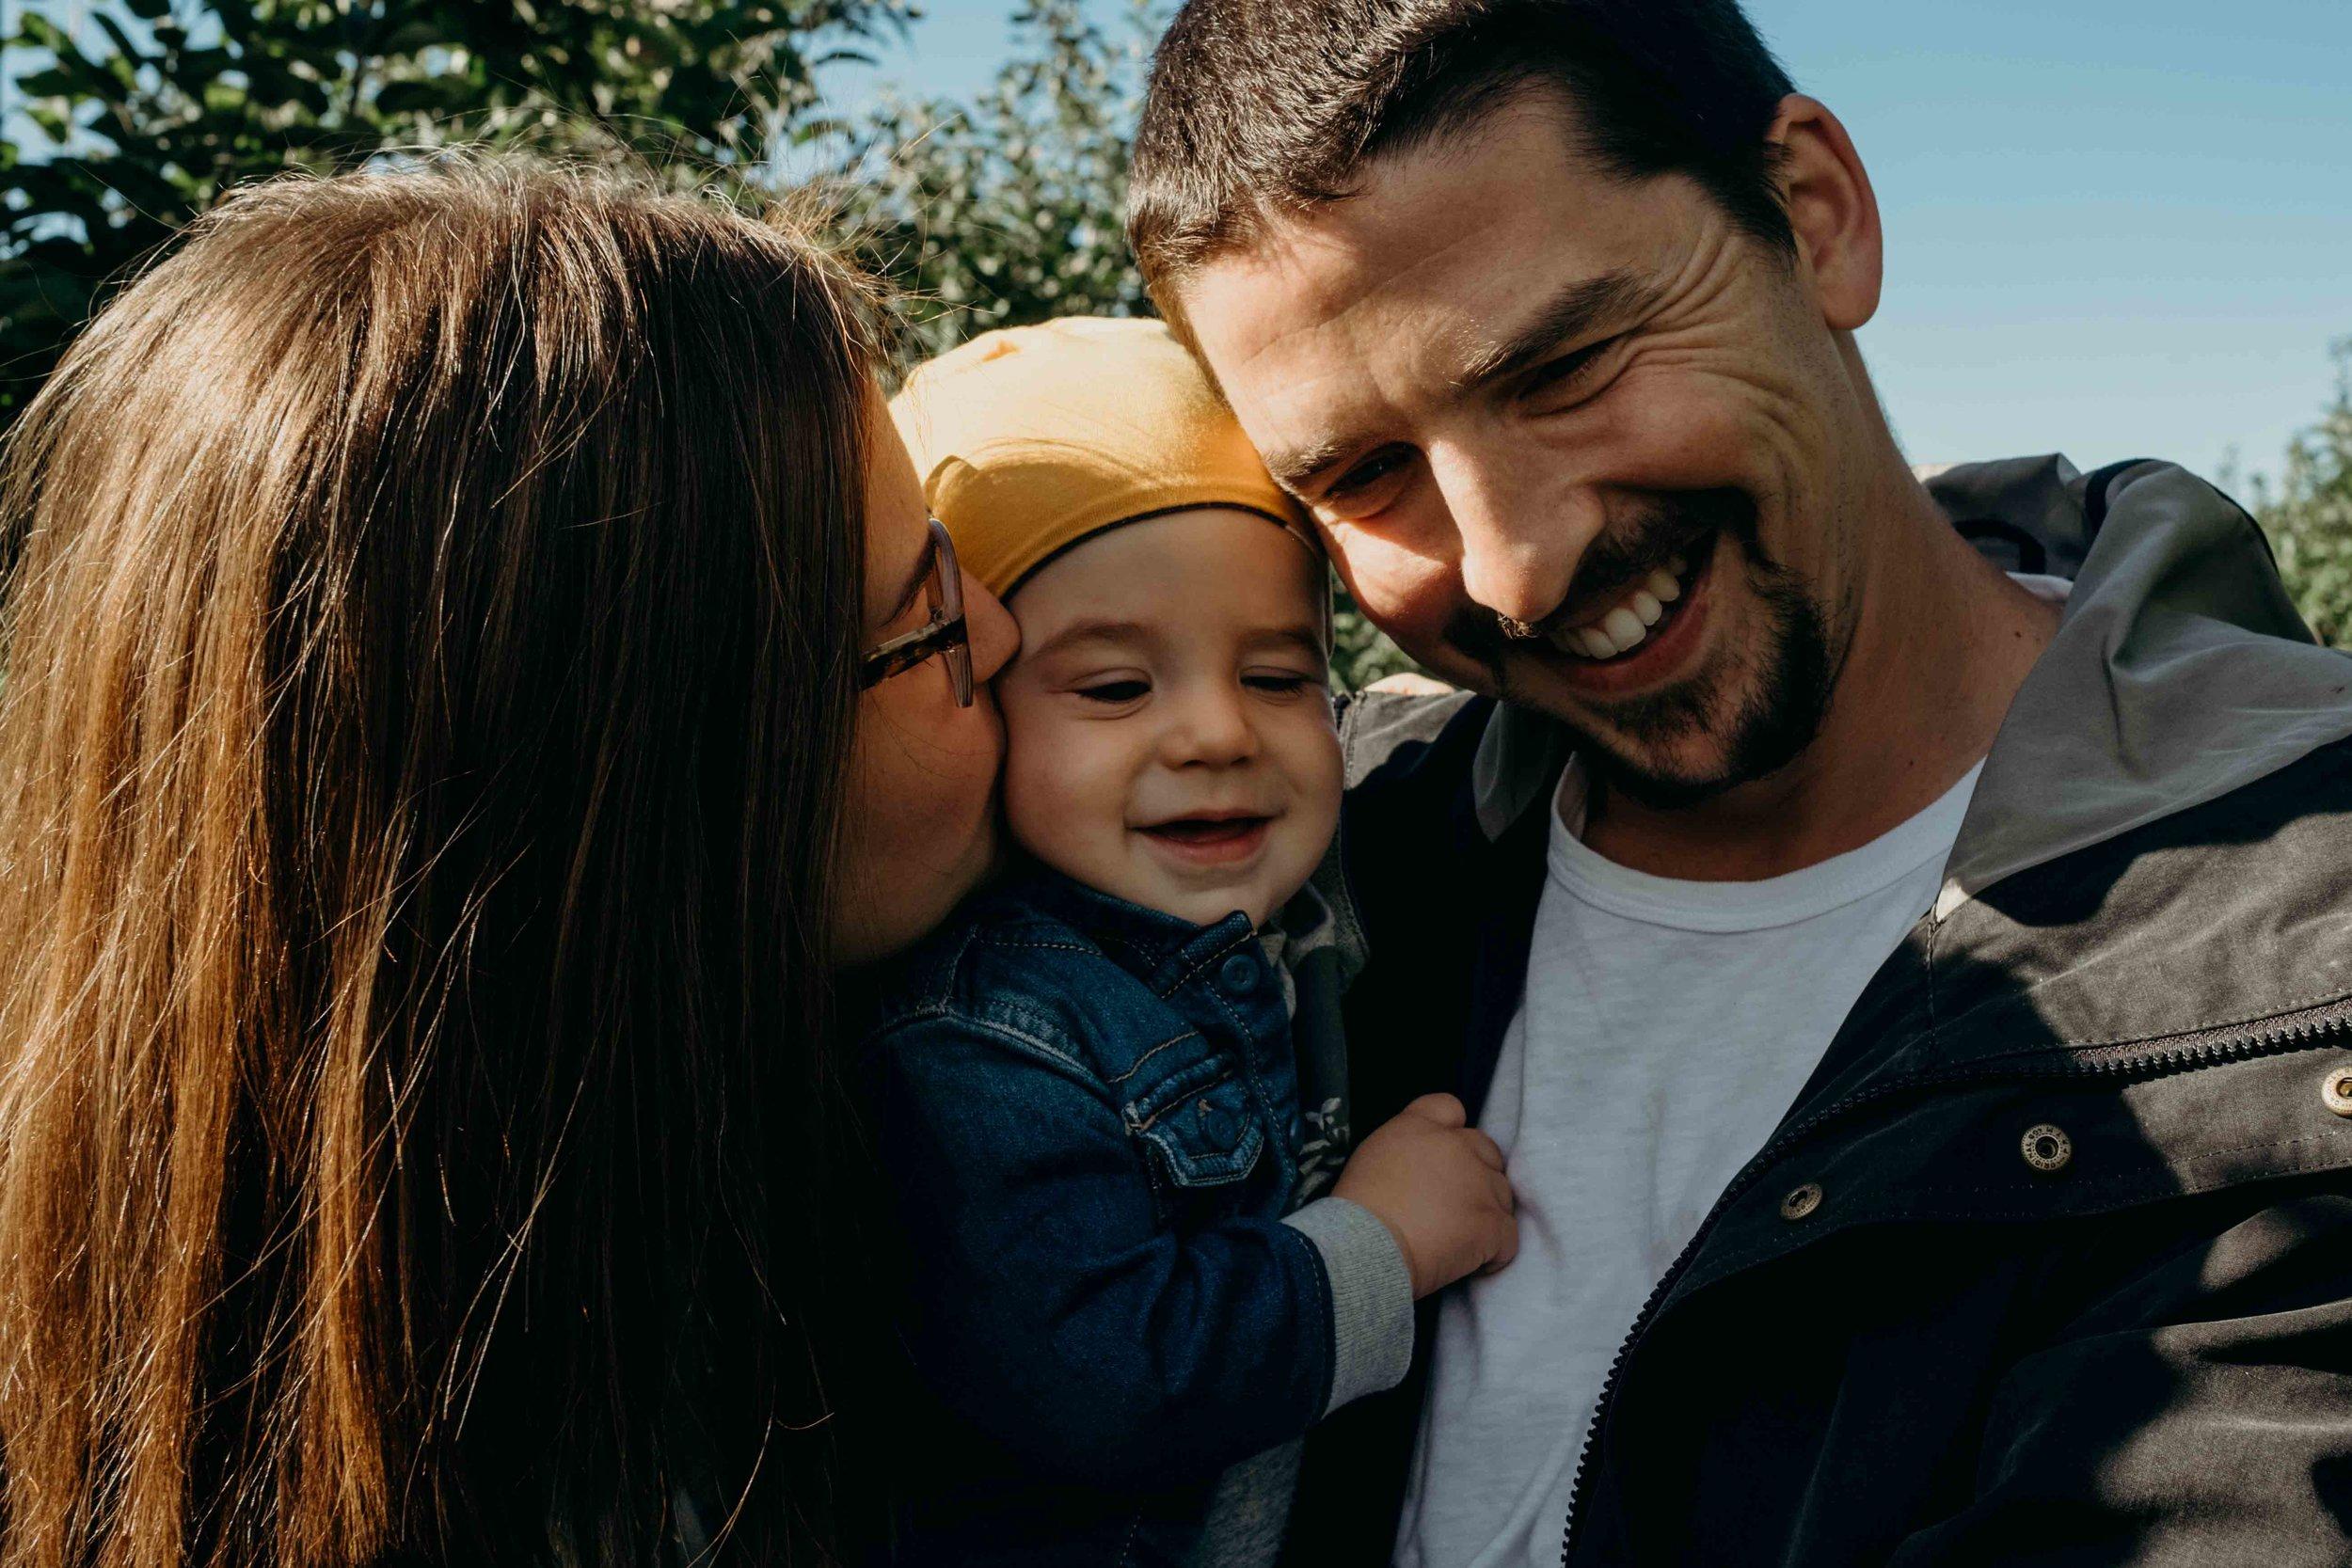 Toronto Lifestyle Family Photographer - Ali Happer Photo.jpg